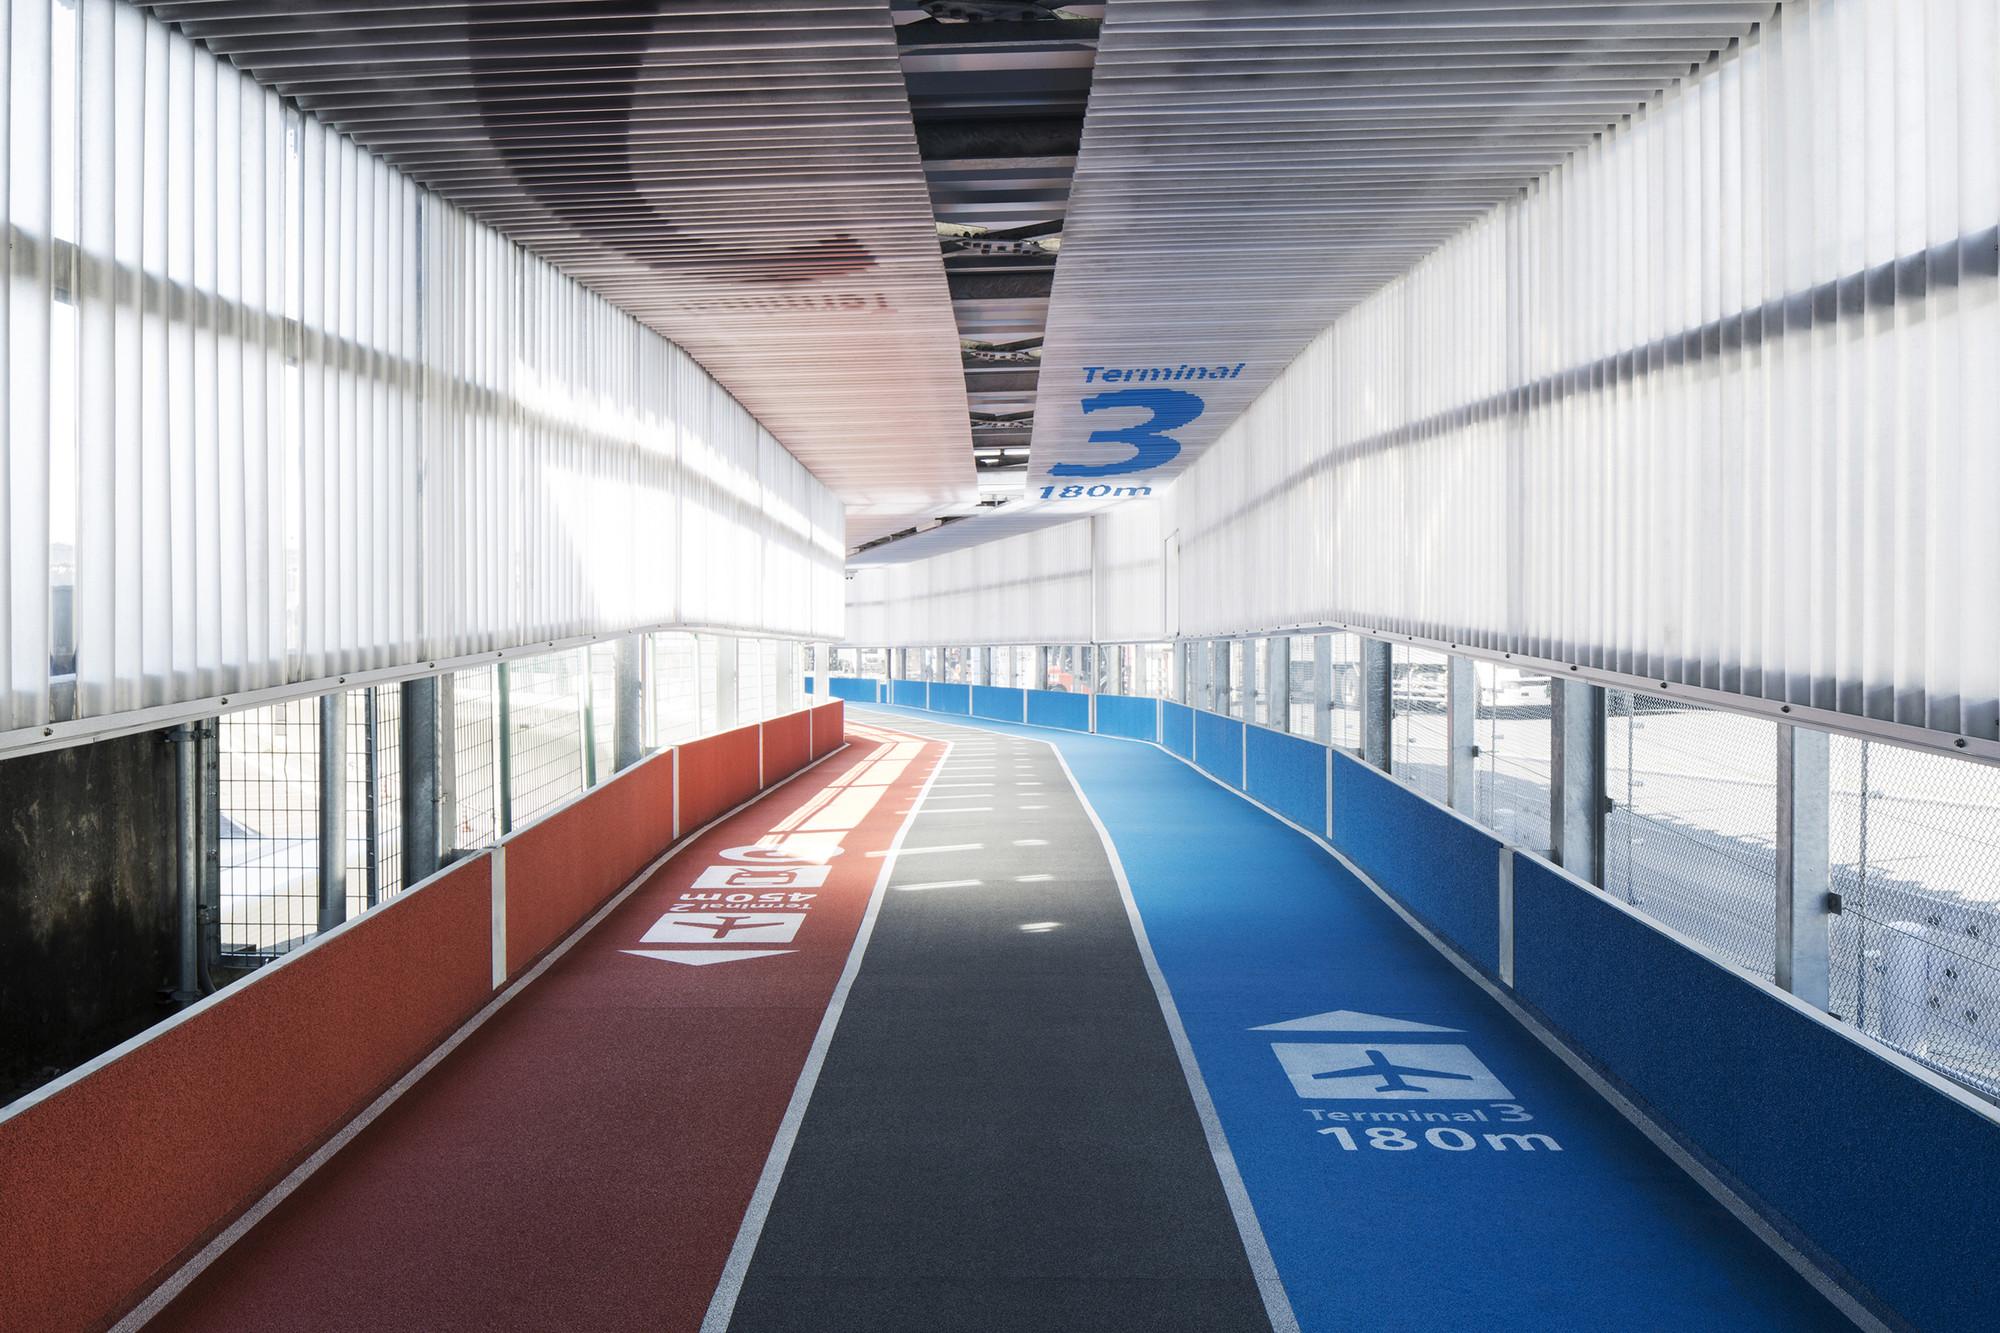 Narita International Airport Terminal 3 / NIKKEN SEKKEI + Ryohin Keikaku  + PARTY, © Kenta Hasegawa